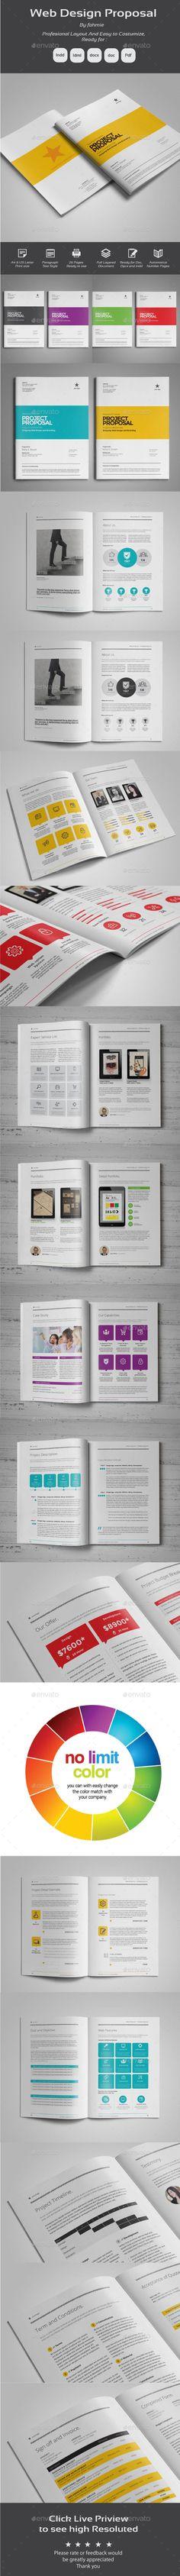 Sponsorship Prospectus | Pinterest | Proposals, Template and ...